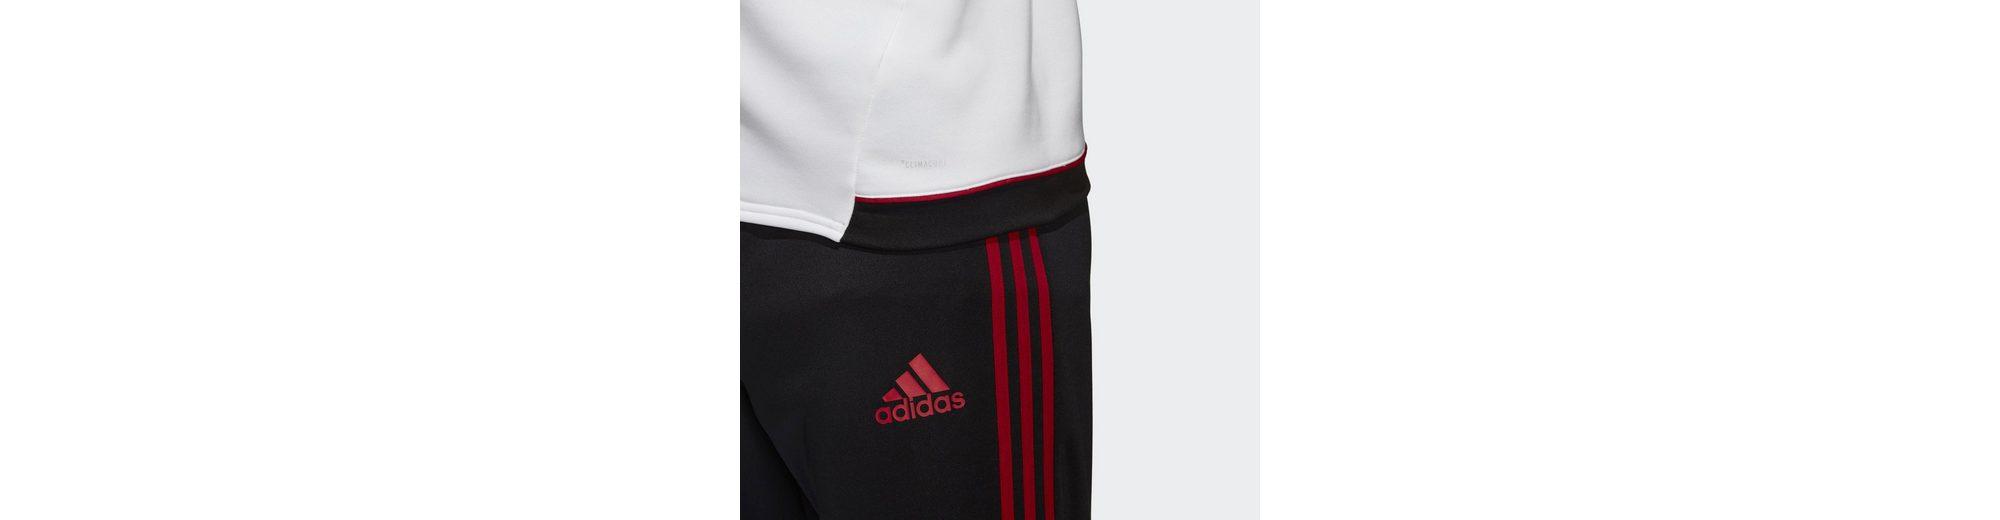 adidas Performance Sporttop AC Mailand Trainingshose Bester Platz Verkauf Günstigsten Preis Neuankömmling HiQwR